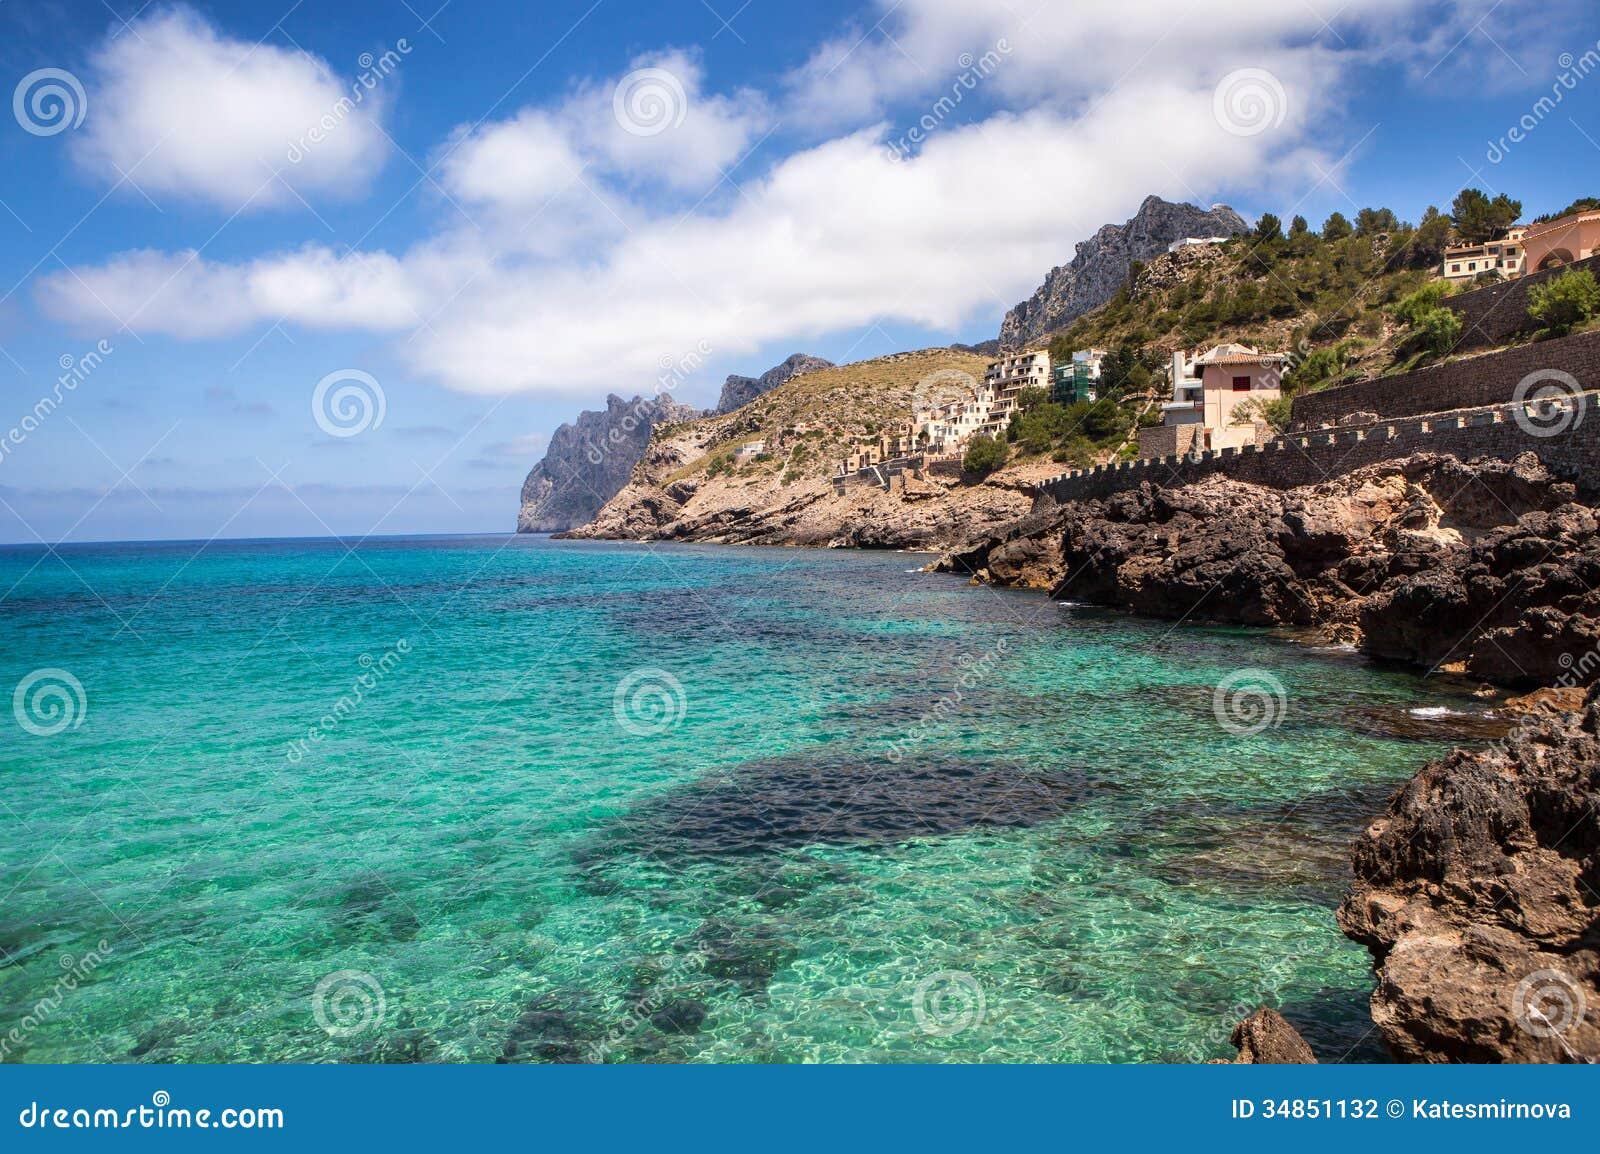 Mediterranean Sea And Rocky Coast Of Spain Stock Photo ...